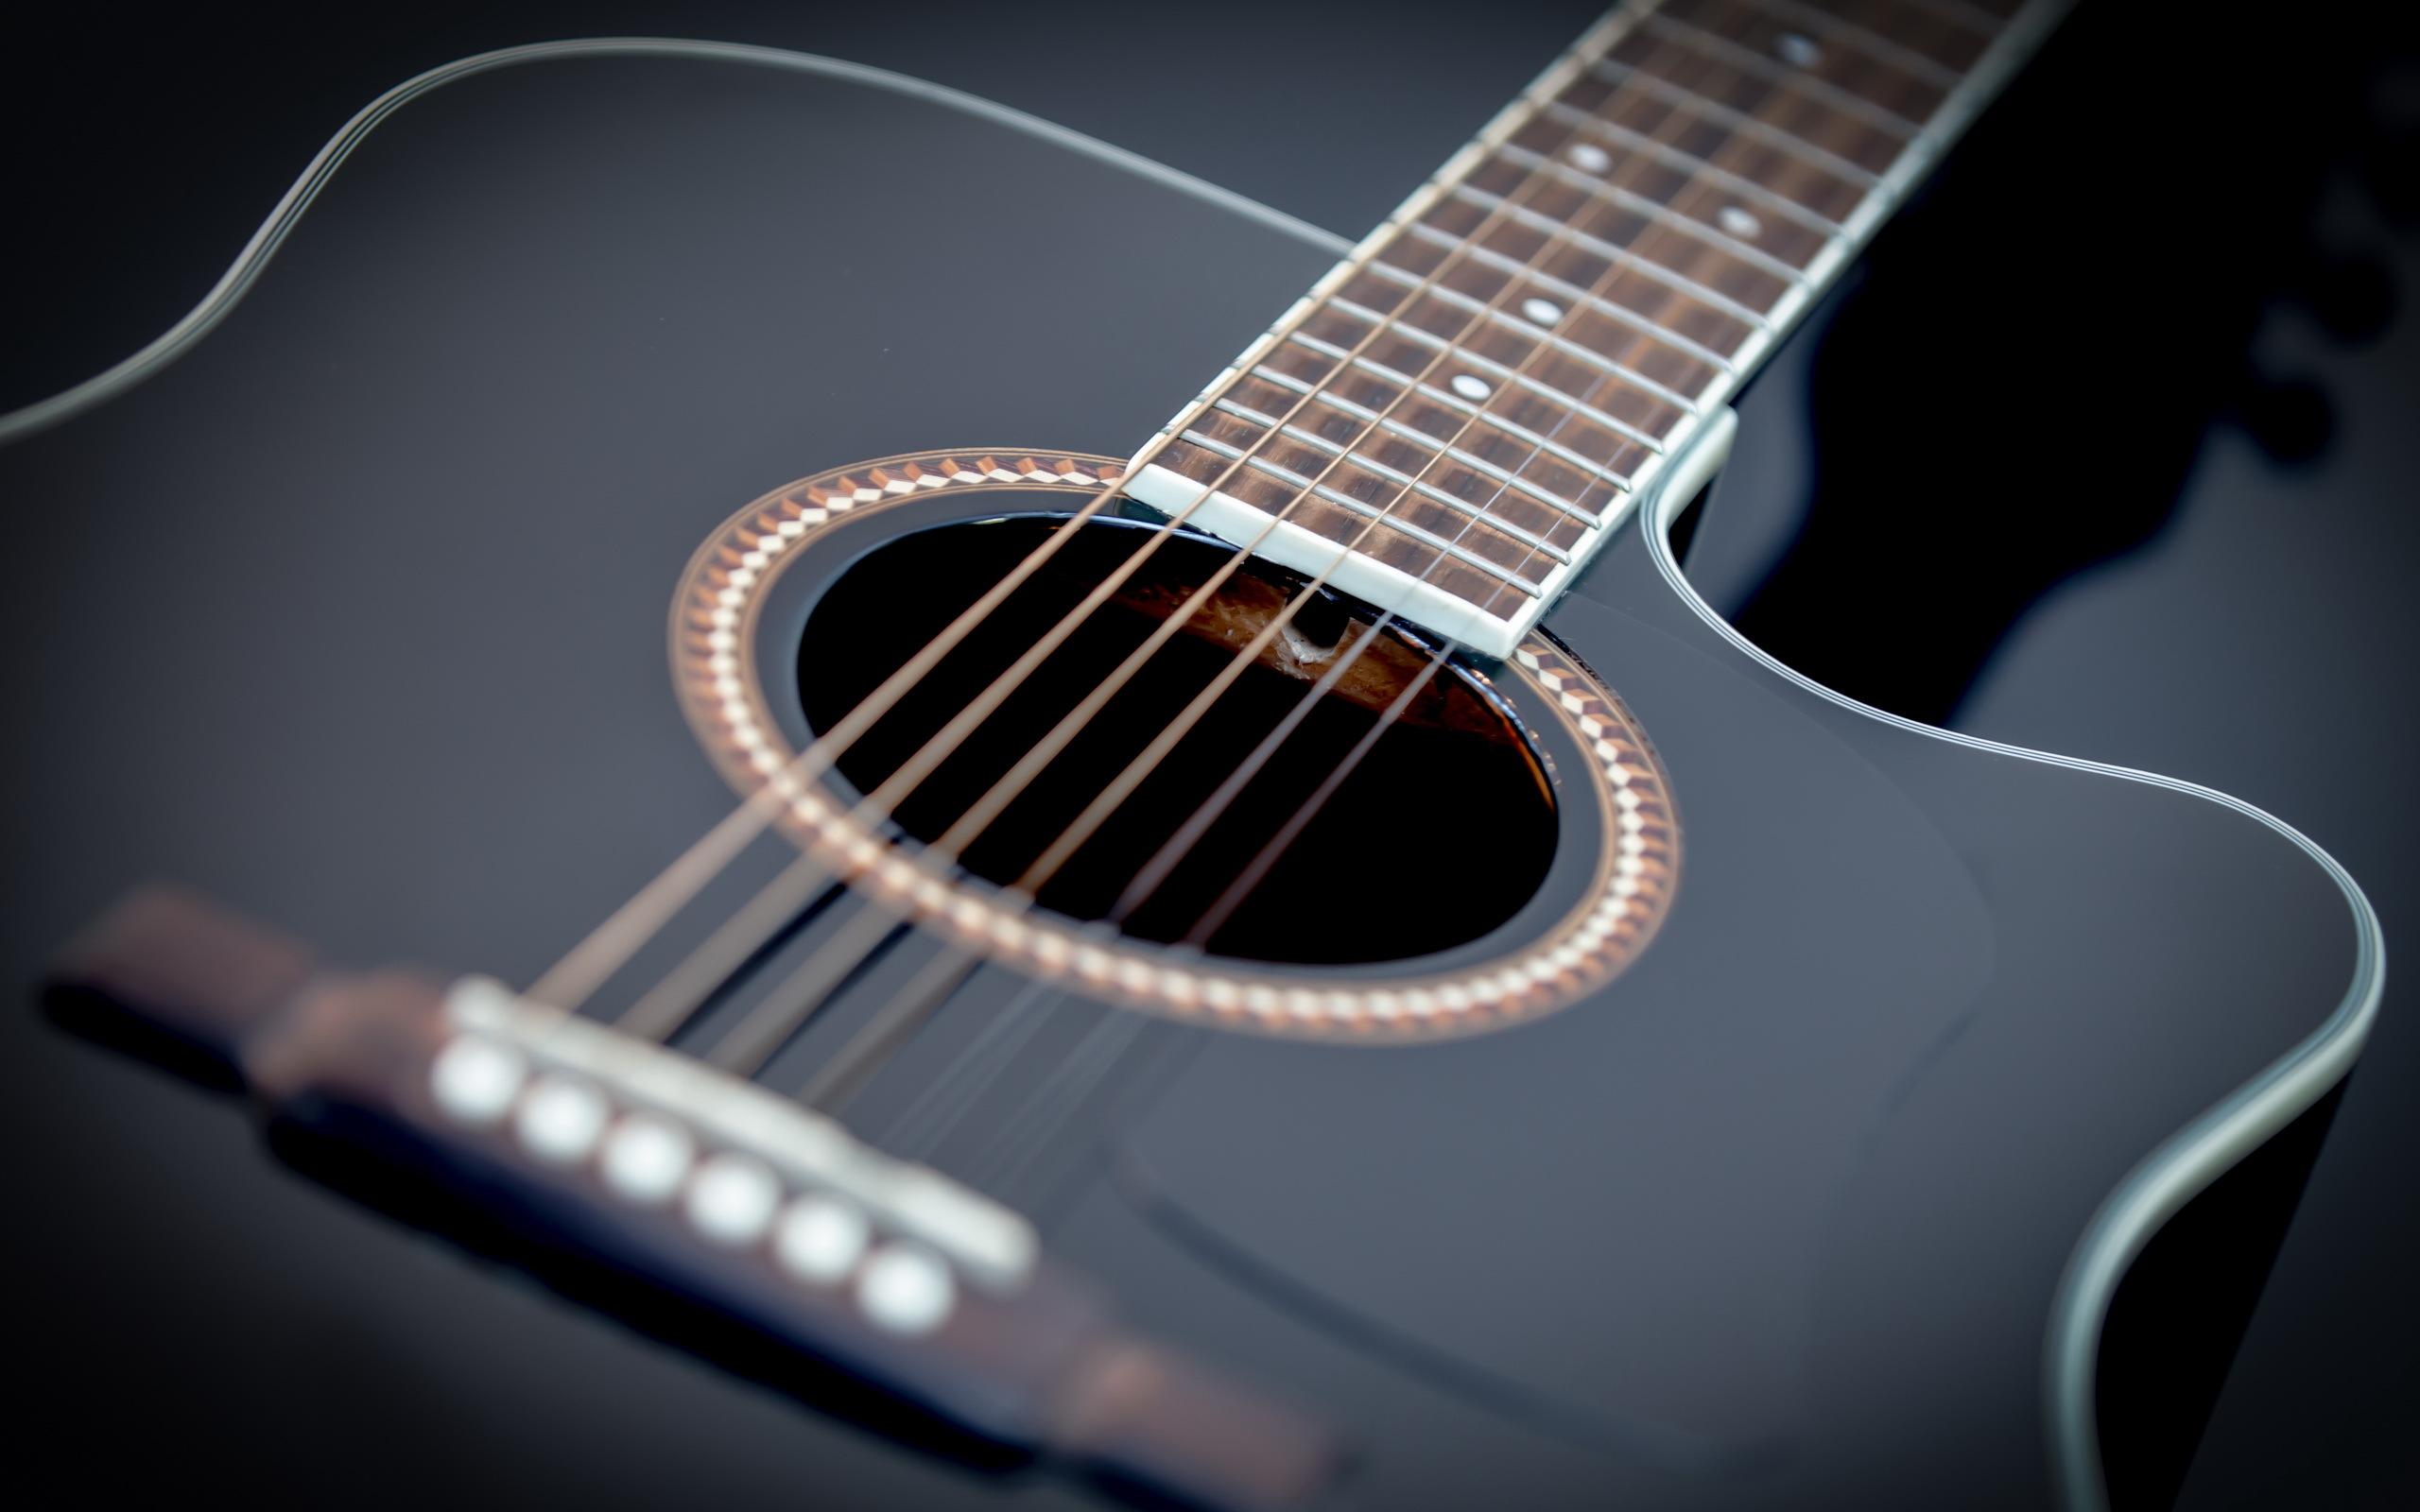 Free Download Black Guitar Hd Wallpaper 2560x1600 For Your Desktop Mobile Tablet Explore 46 Hd Guitar Wallpapers Acoustic Guitar Wallpaper Hd Guitar Wallpapers 1920x1080 Widescreen Guitar Background Wallpaper